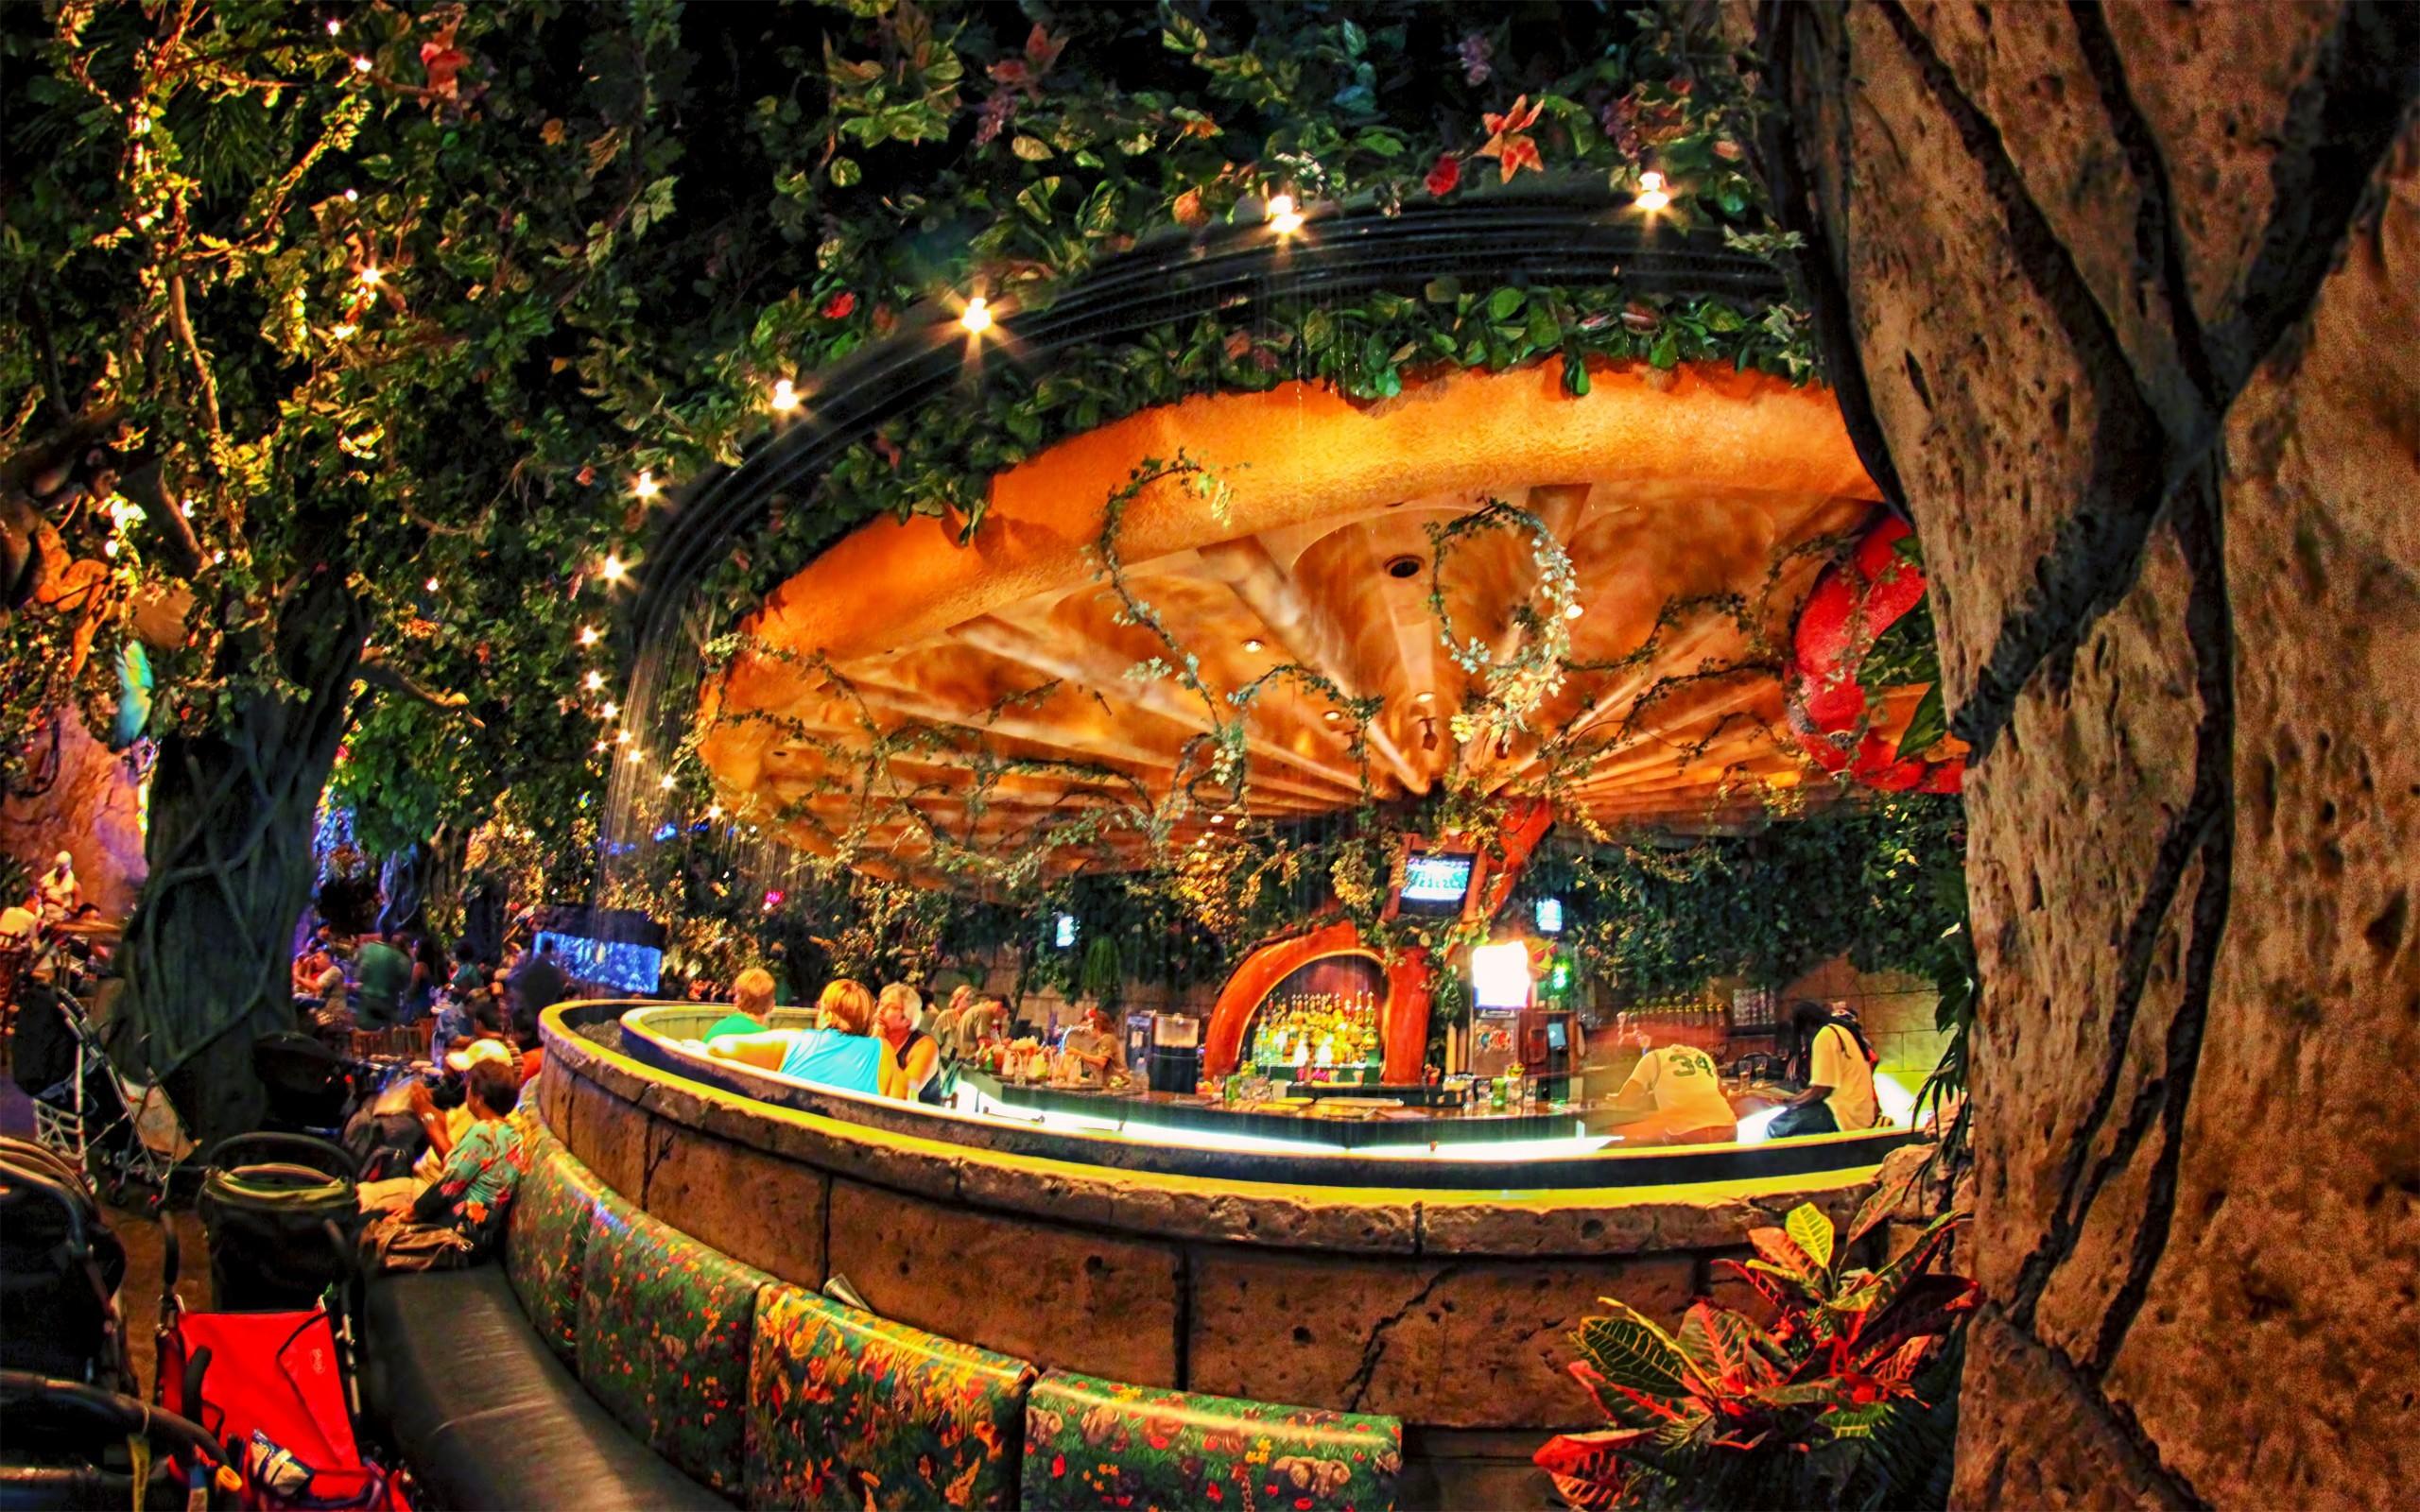 Free Desktop Wallpaper Niagara Falls Unique Bar With A Forest Theme Lifestyle